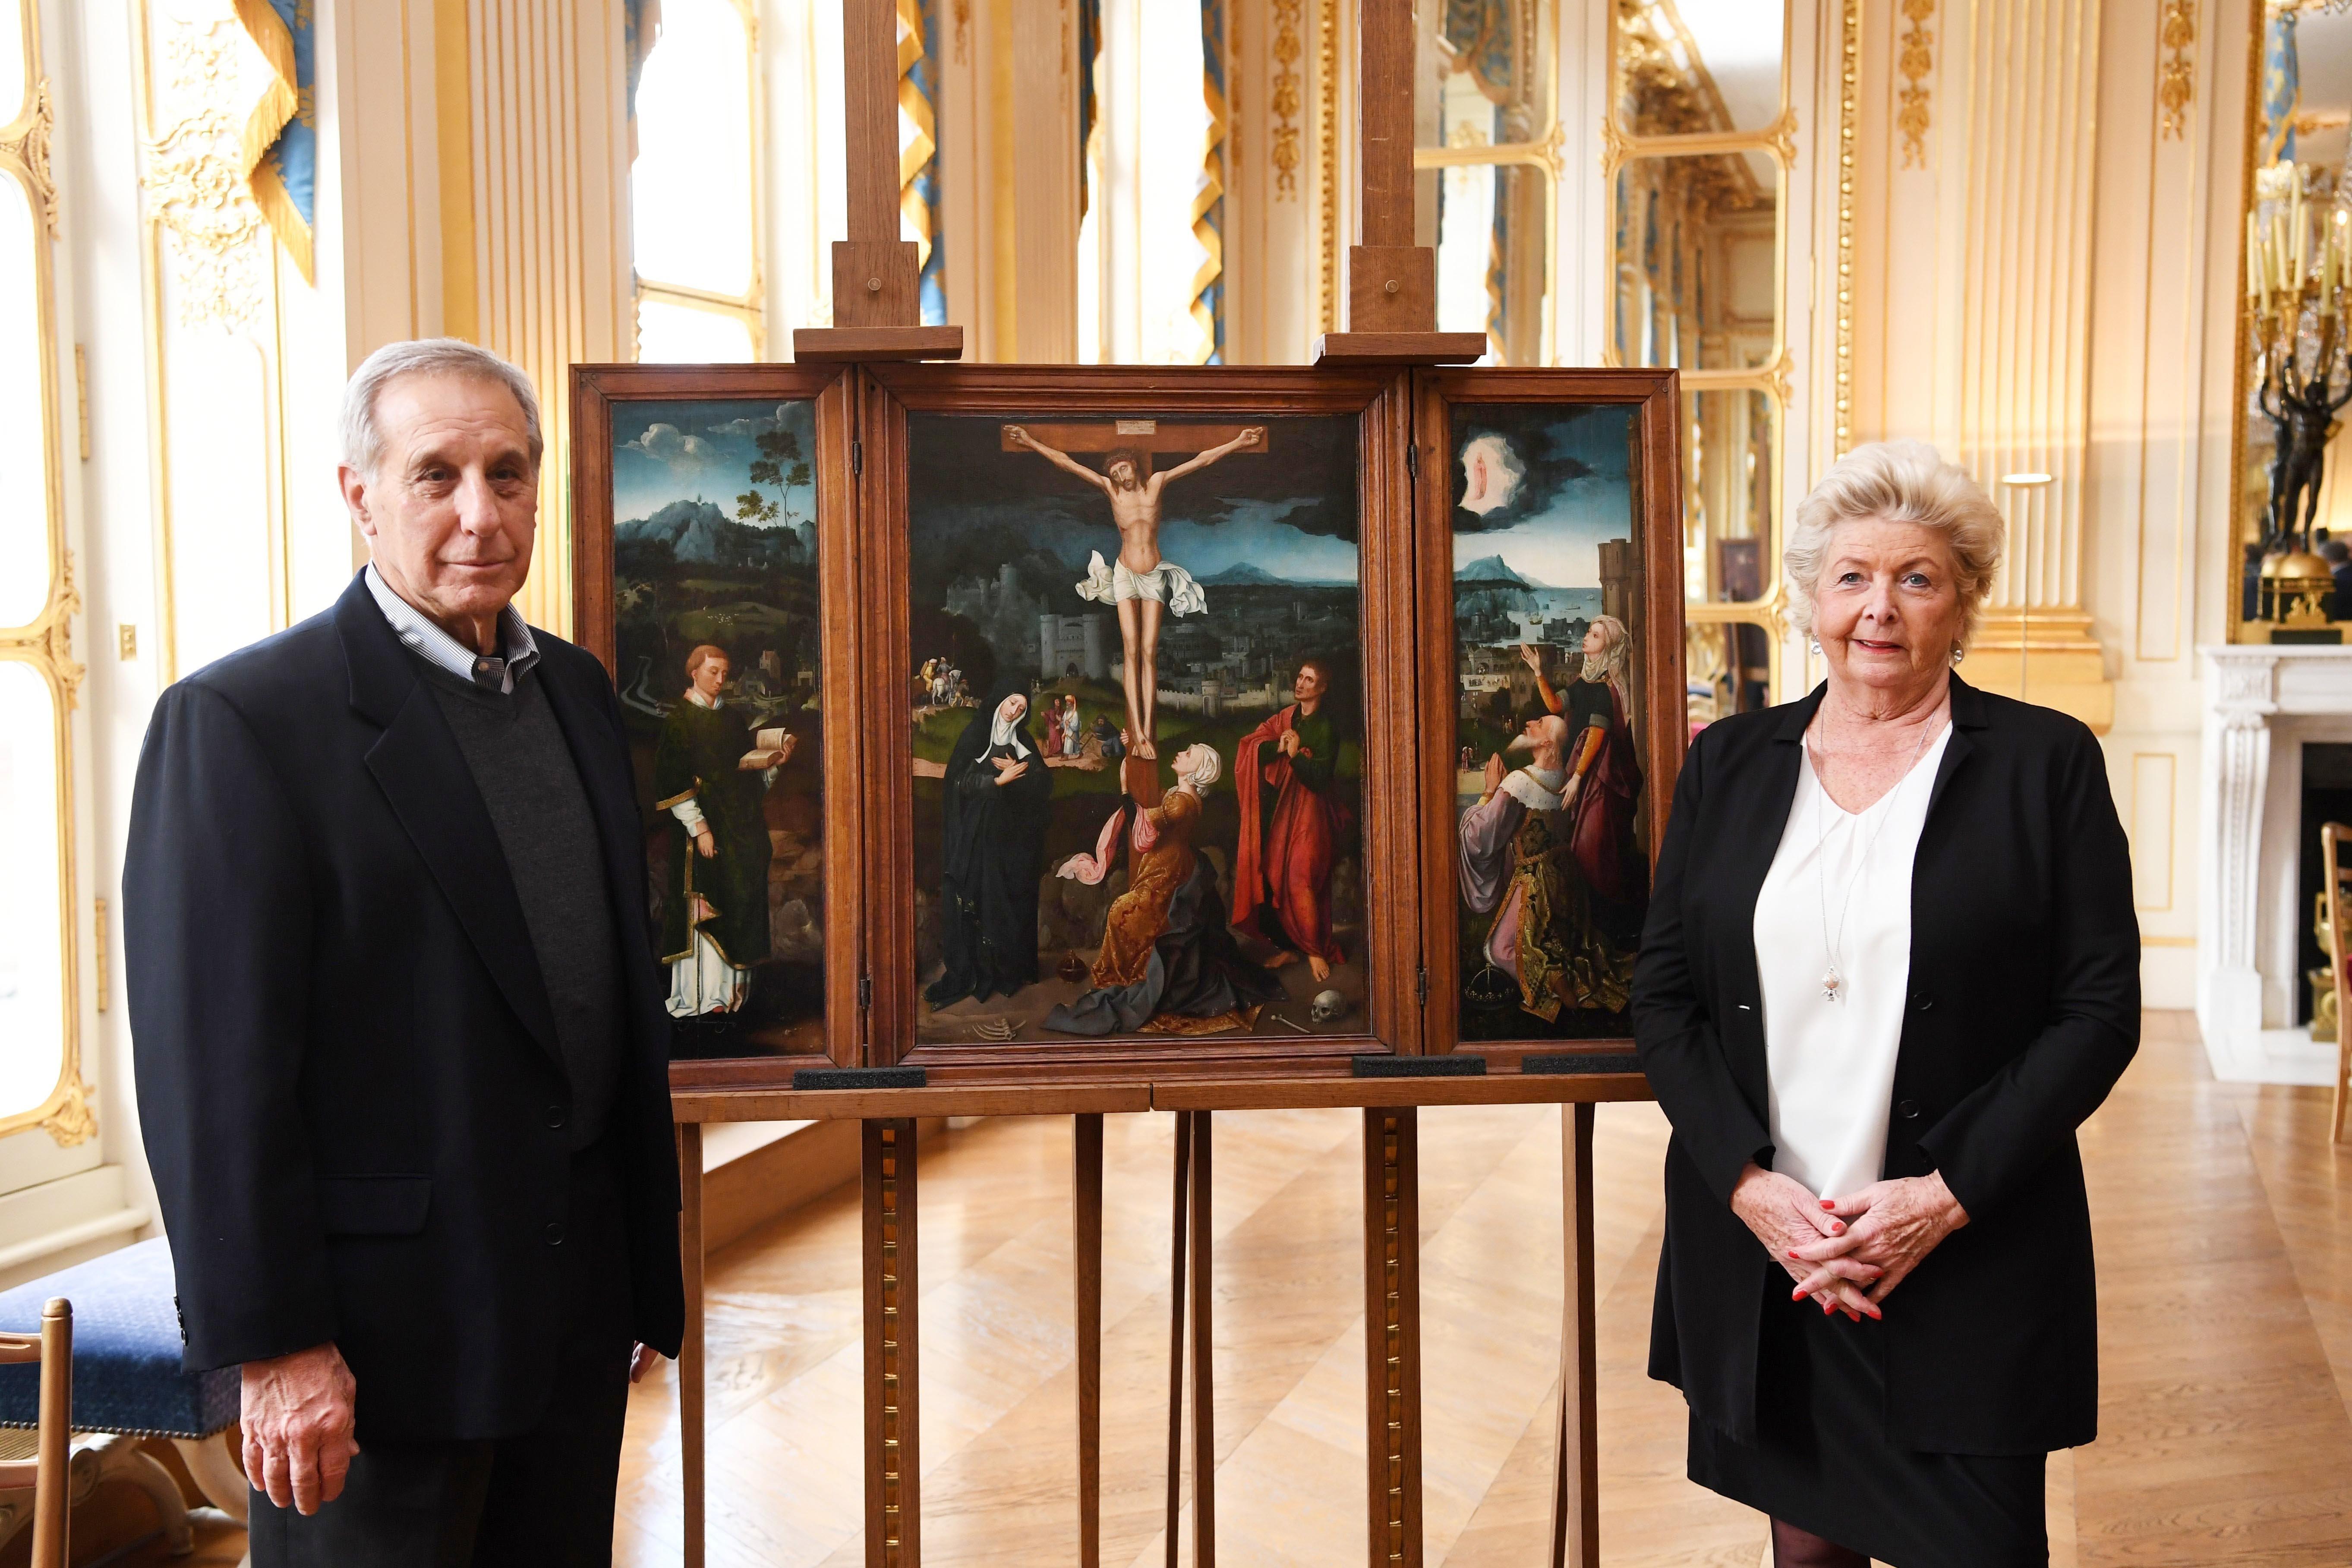 France Returns Artwork To Descendants Of Jewish Couple Who Fled Nazis